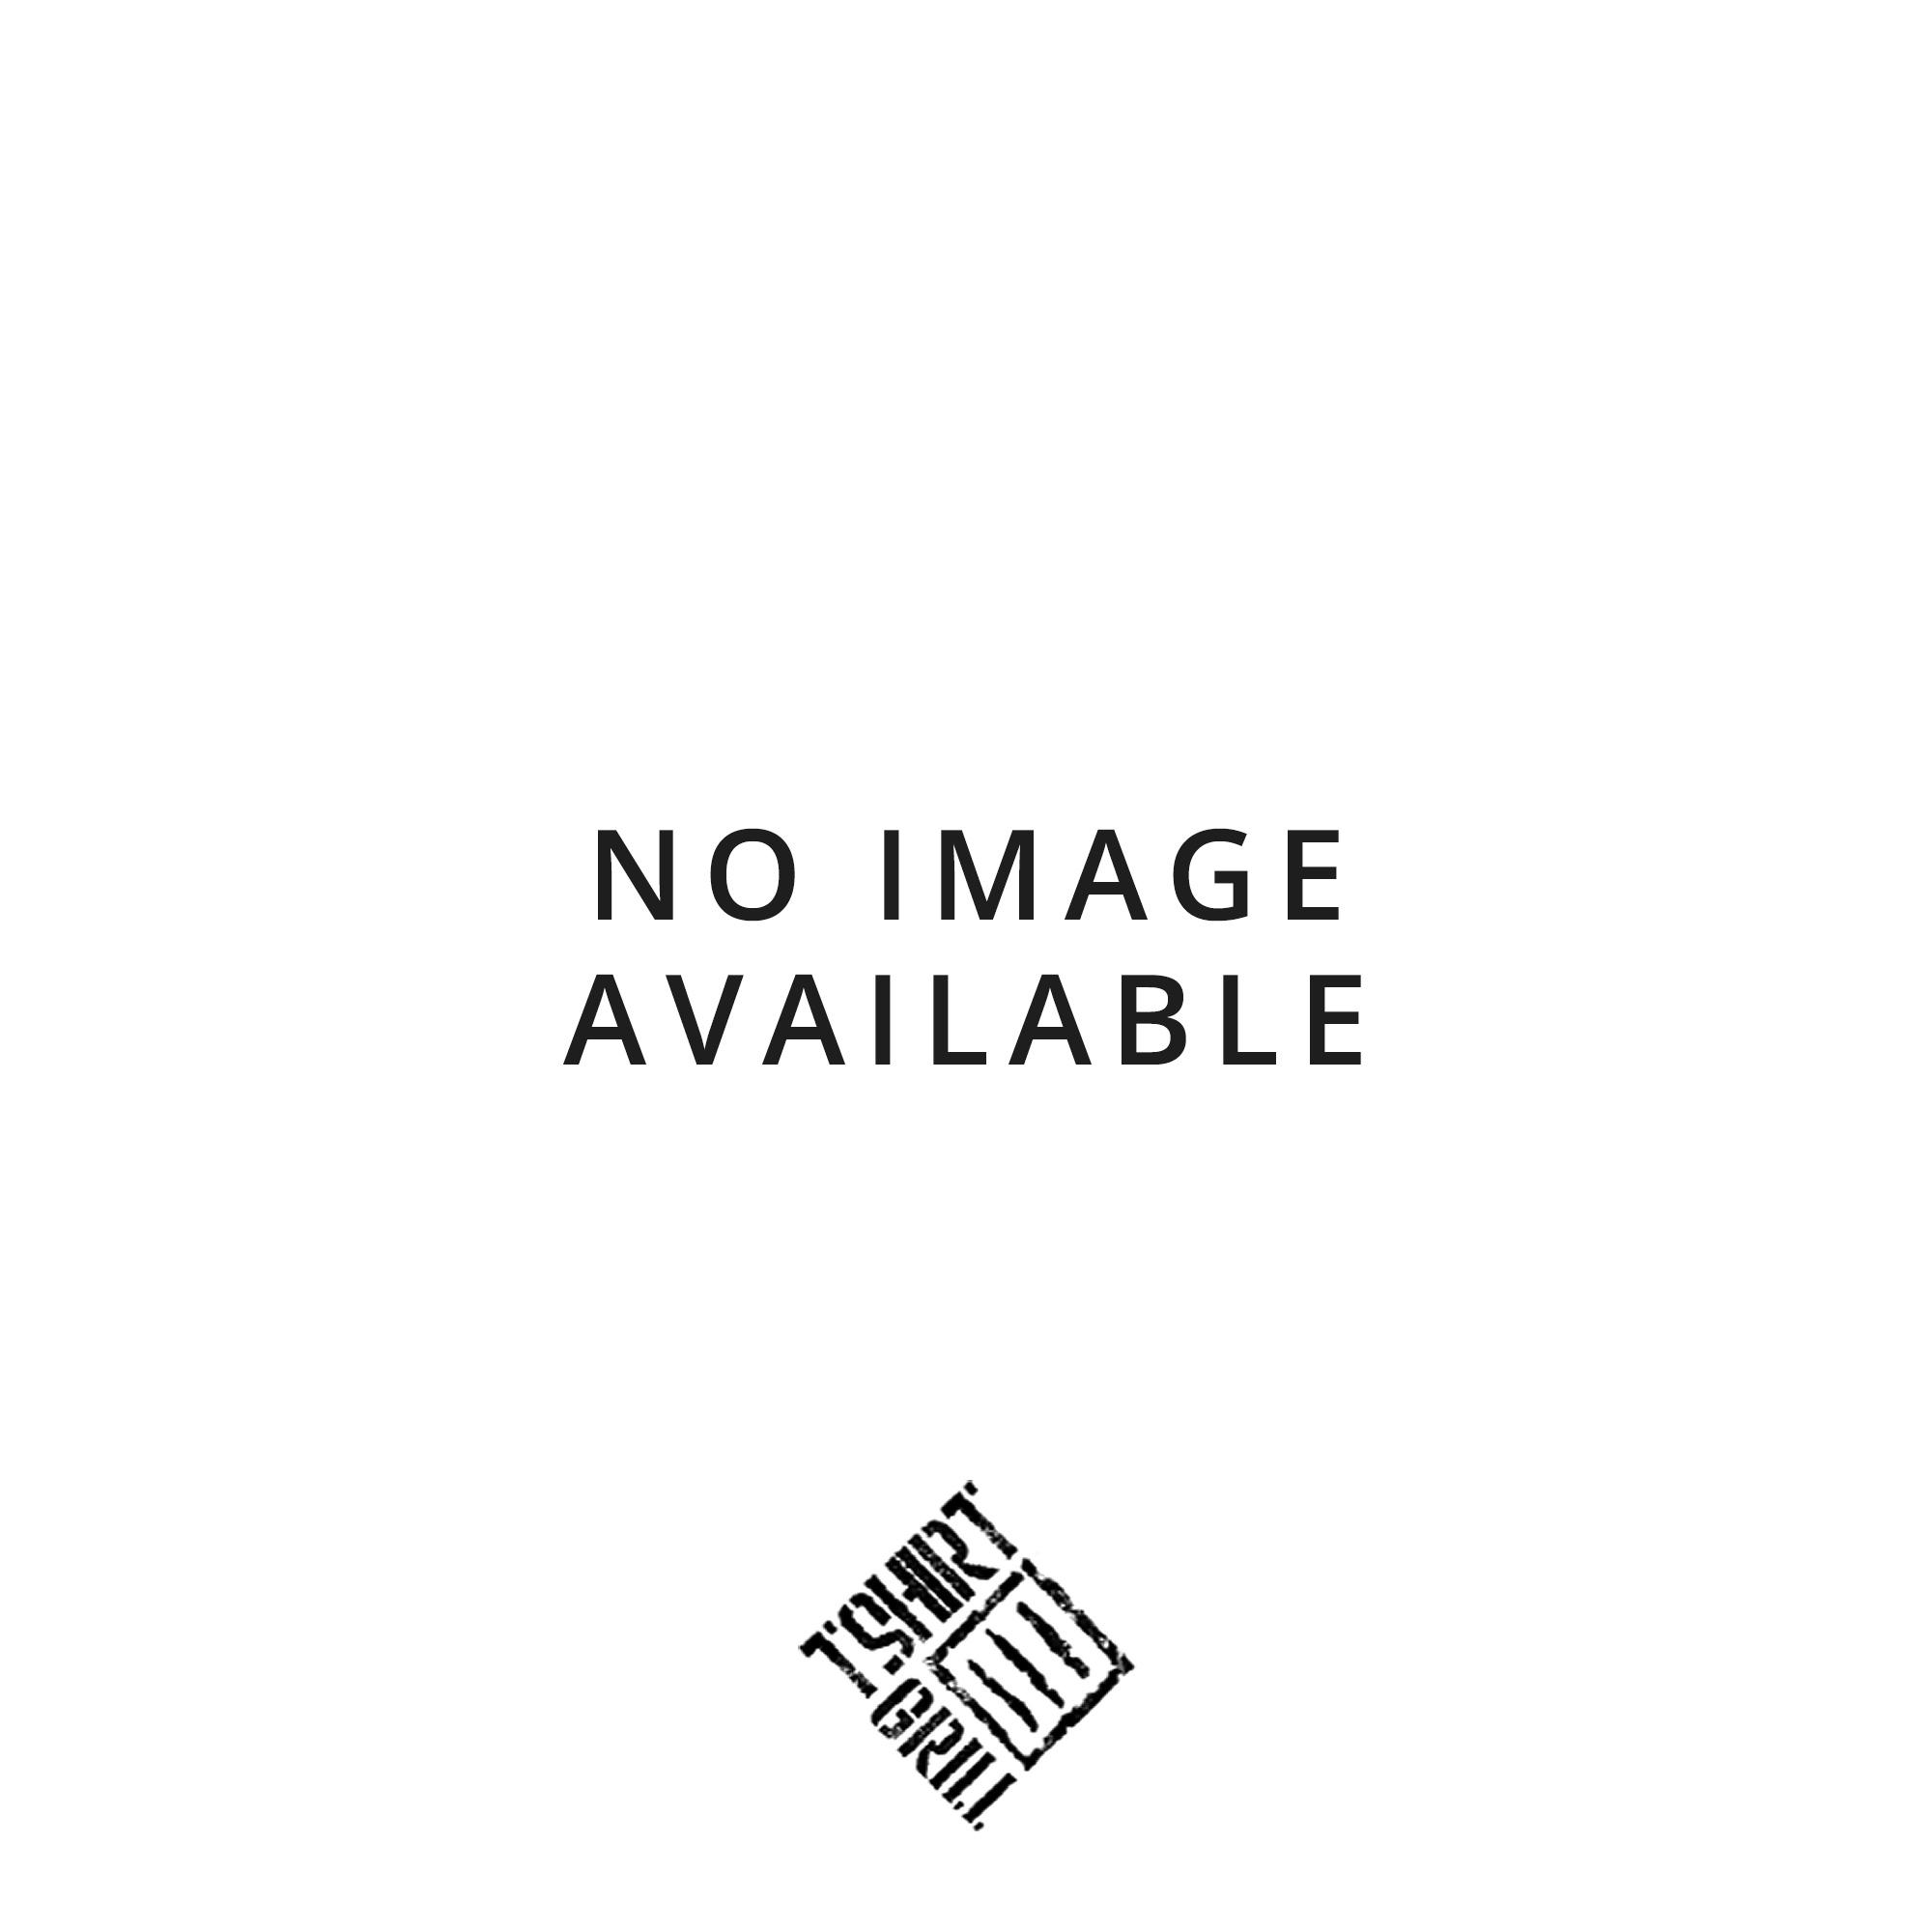 ea627f135 the-cure-robert-smith-photo-t-shirt-p1807-1901_medium.jpg